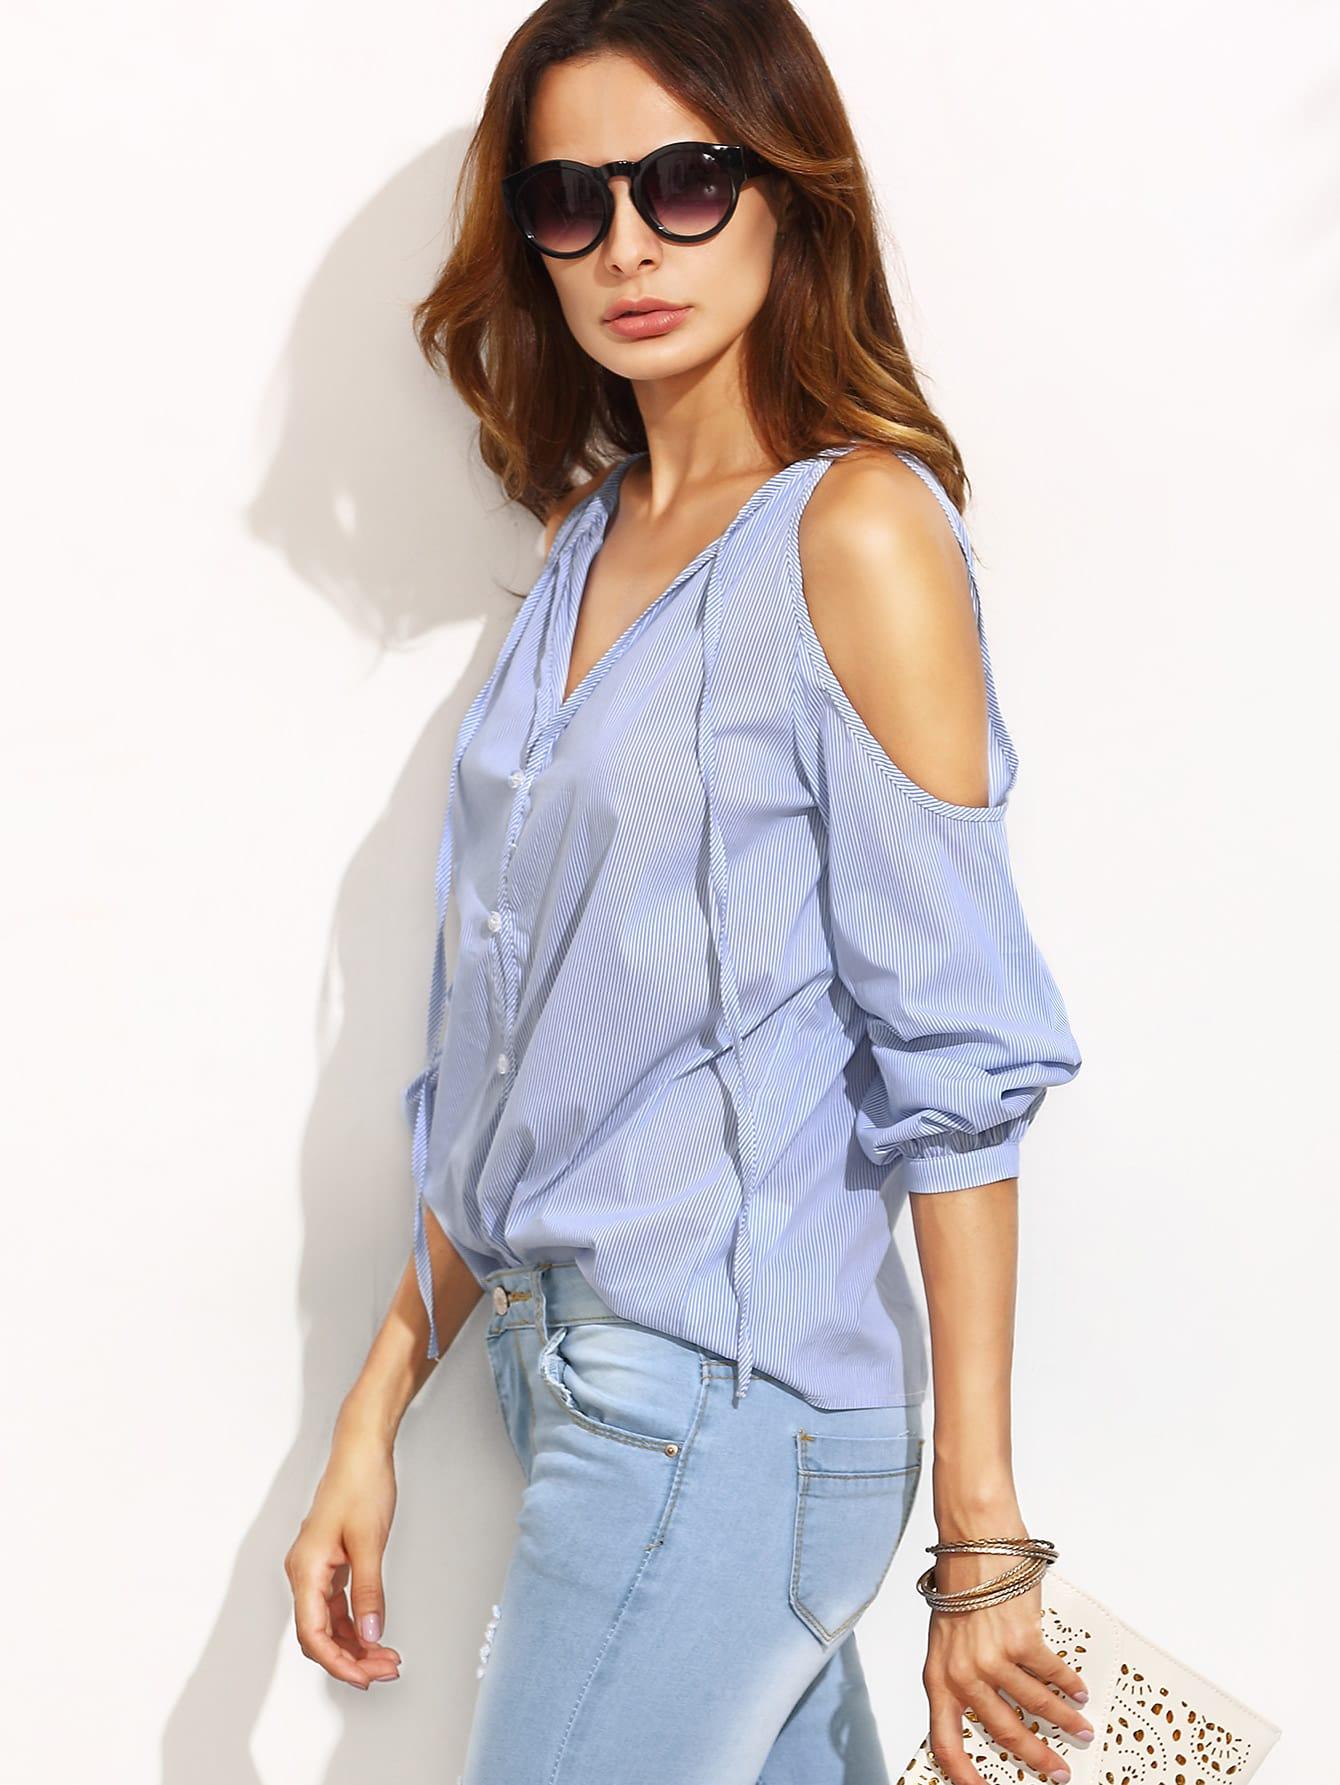 blouse160803713_6